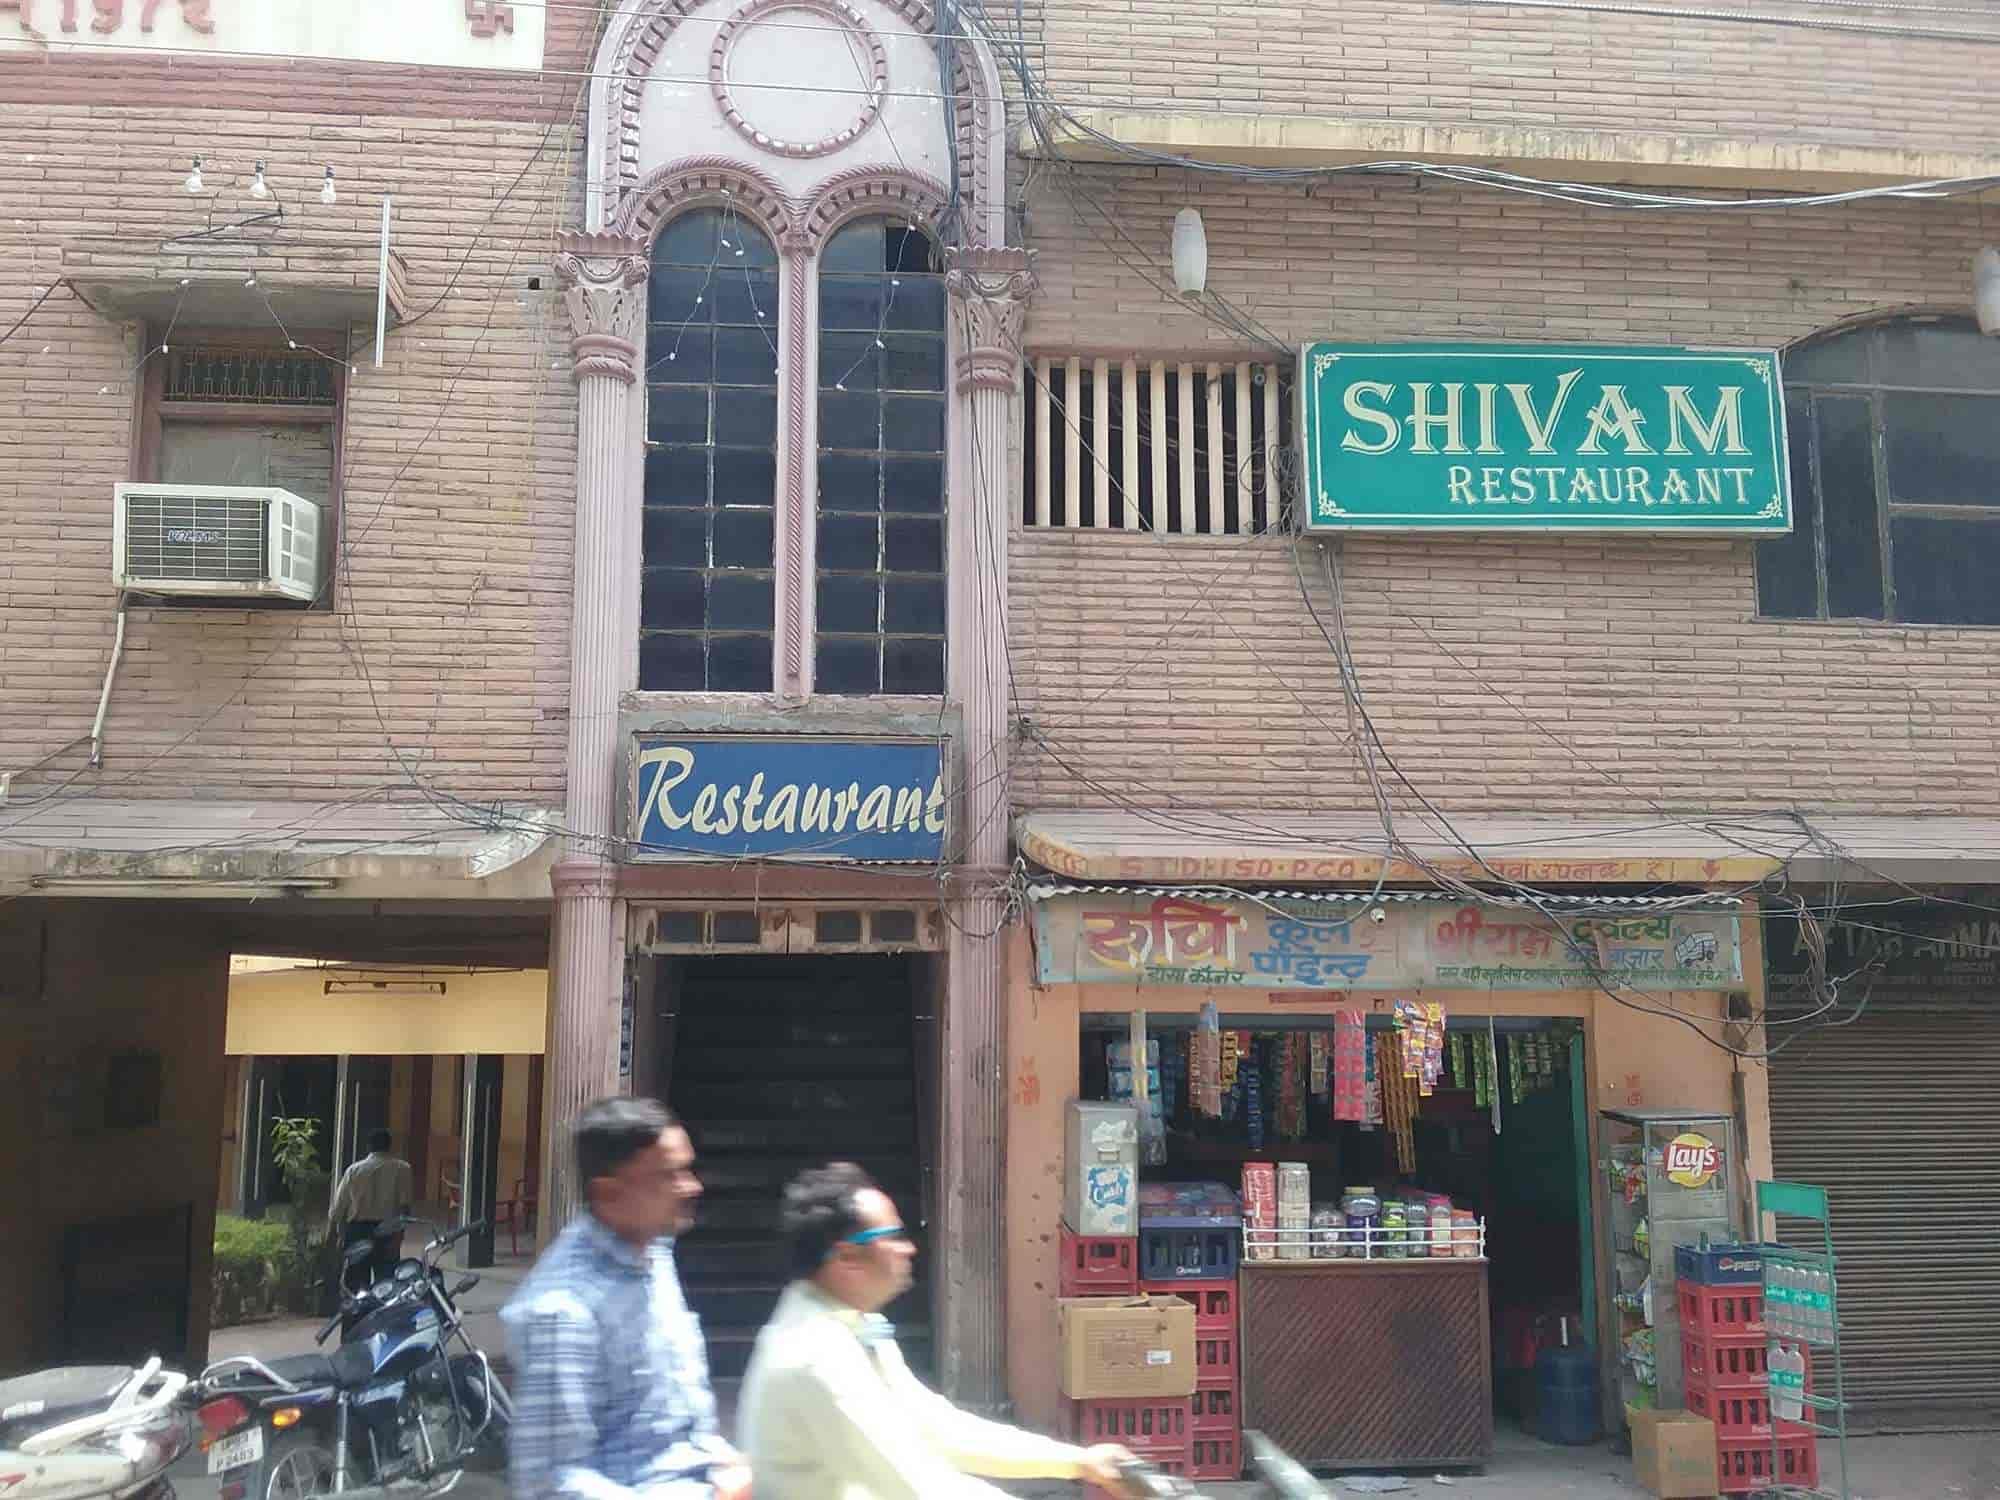 Shivam Restaurant, Akalabad Hasanpur, Firozabad - Pure